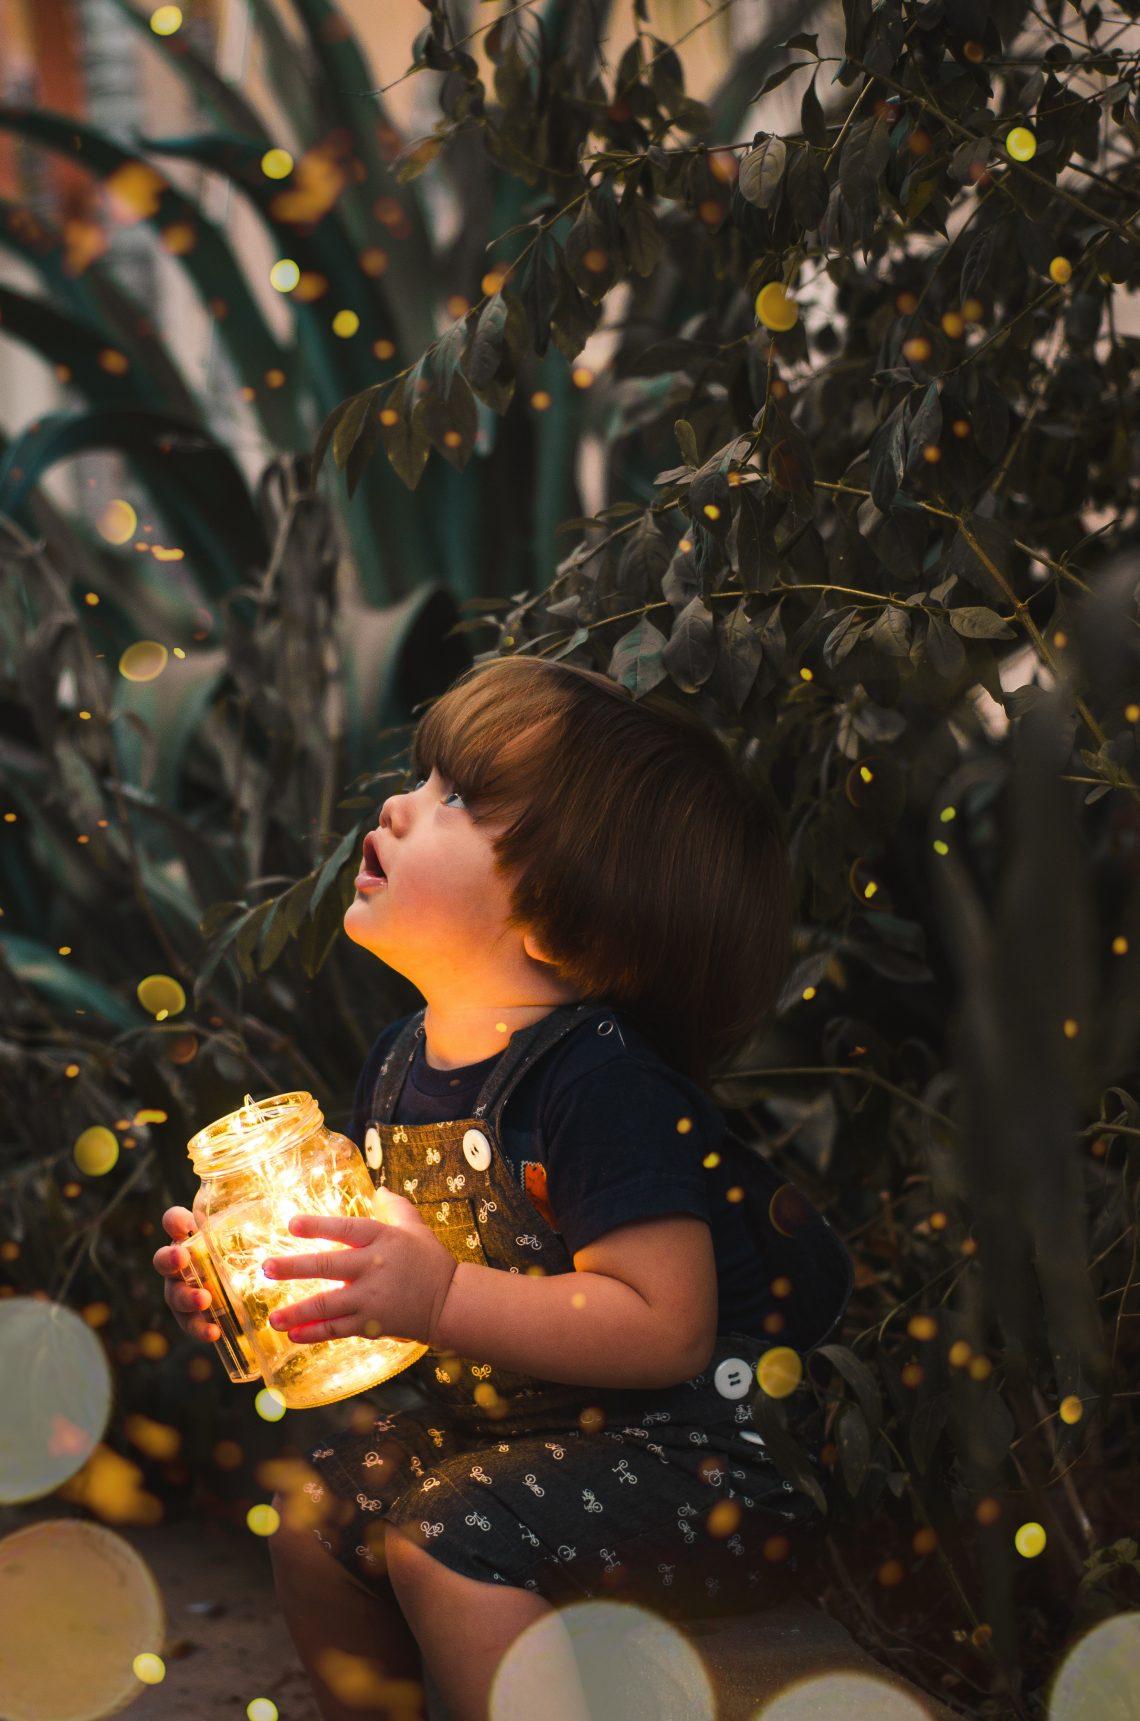 sensetive børn og teknologi